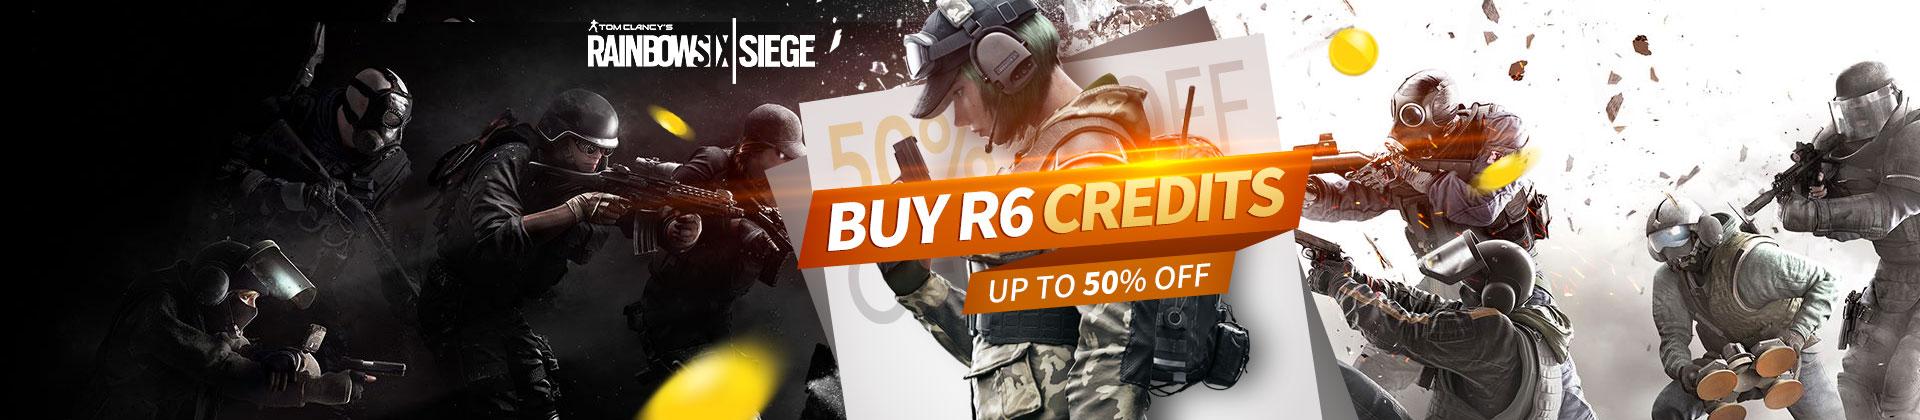 Buy Rainbow Six Siege Credits